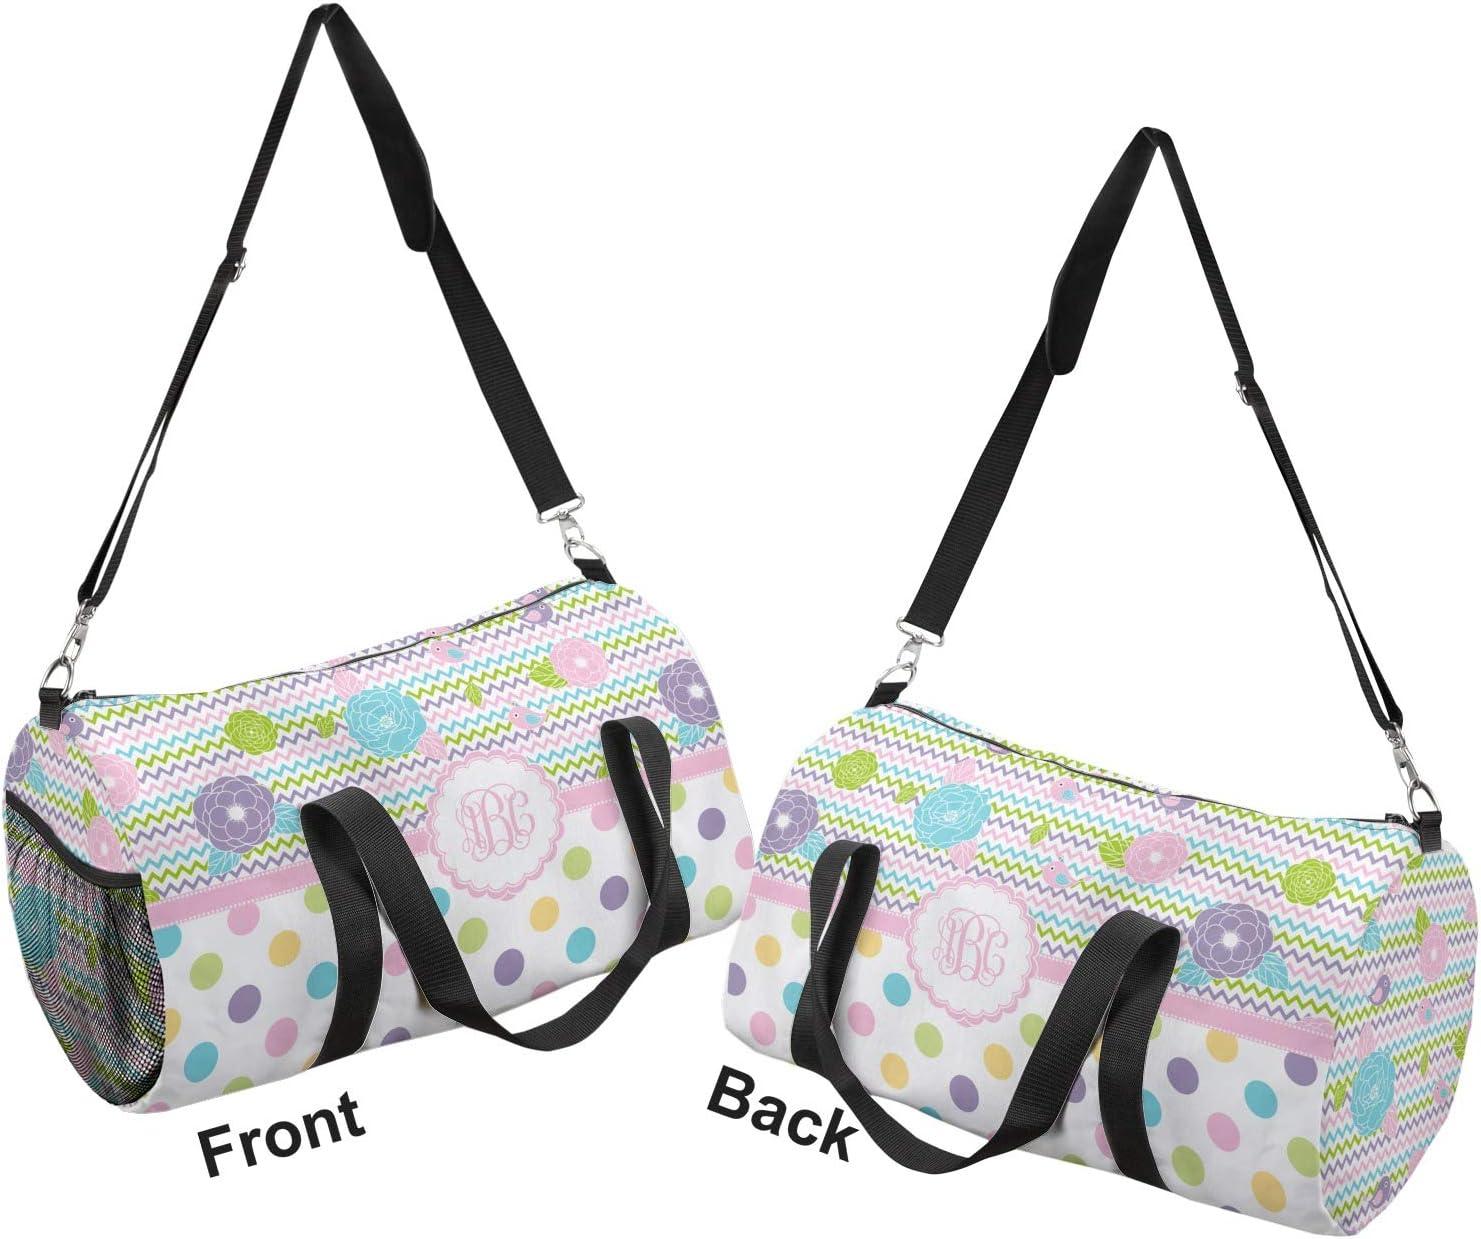 YouCustomizeIt Girly Girl Duffel Bag Personalized